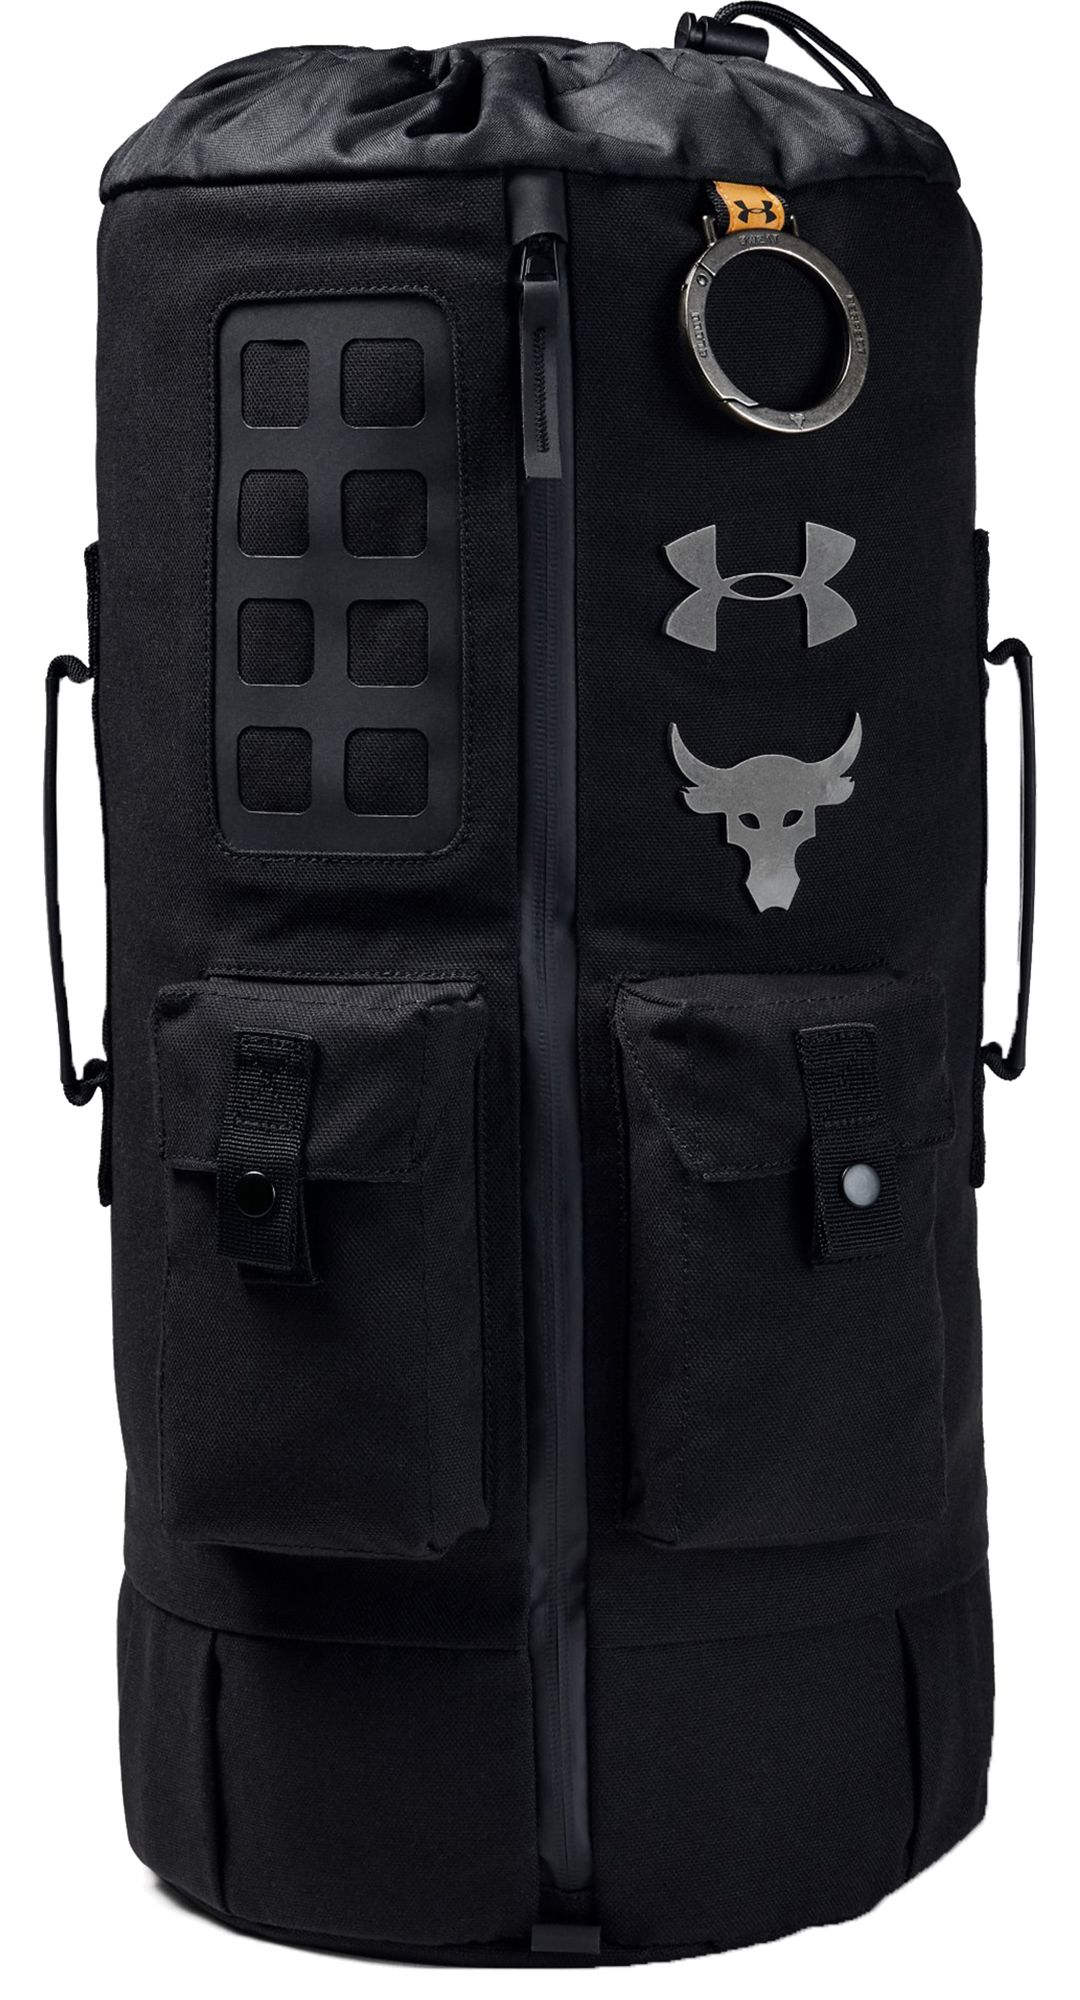 07ecc99ee655 Under Armour Men's Project Rock 60 Gym Bag